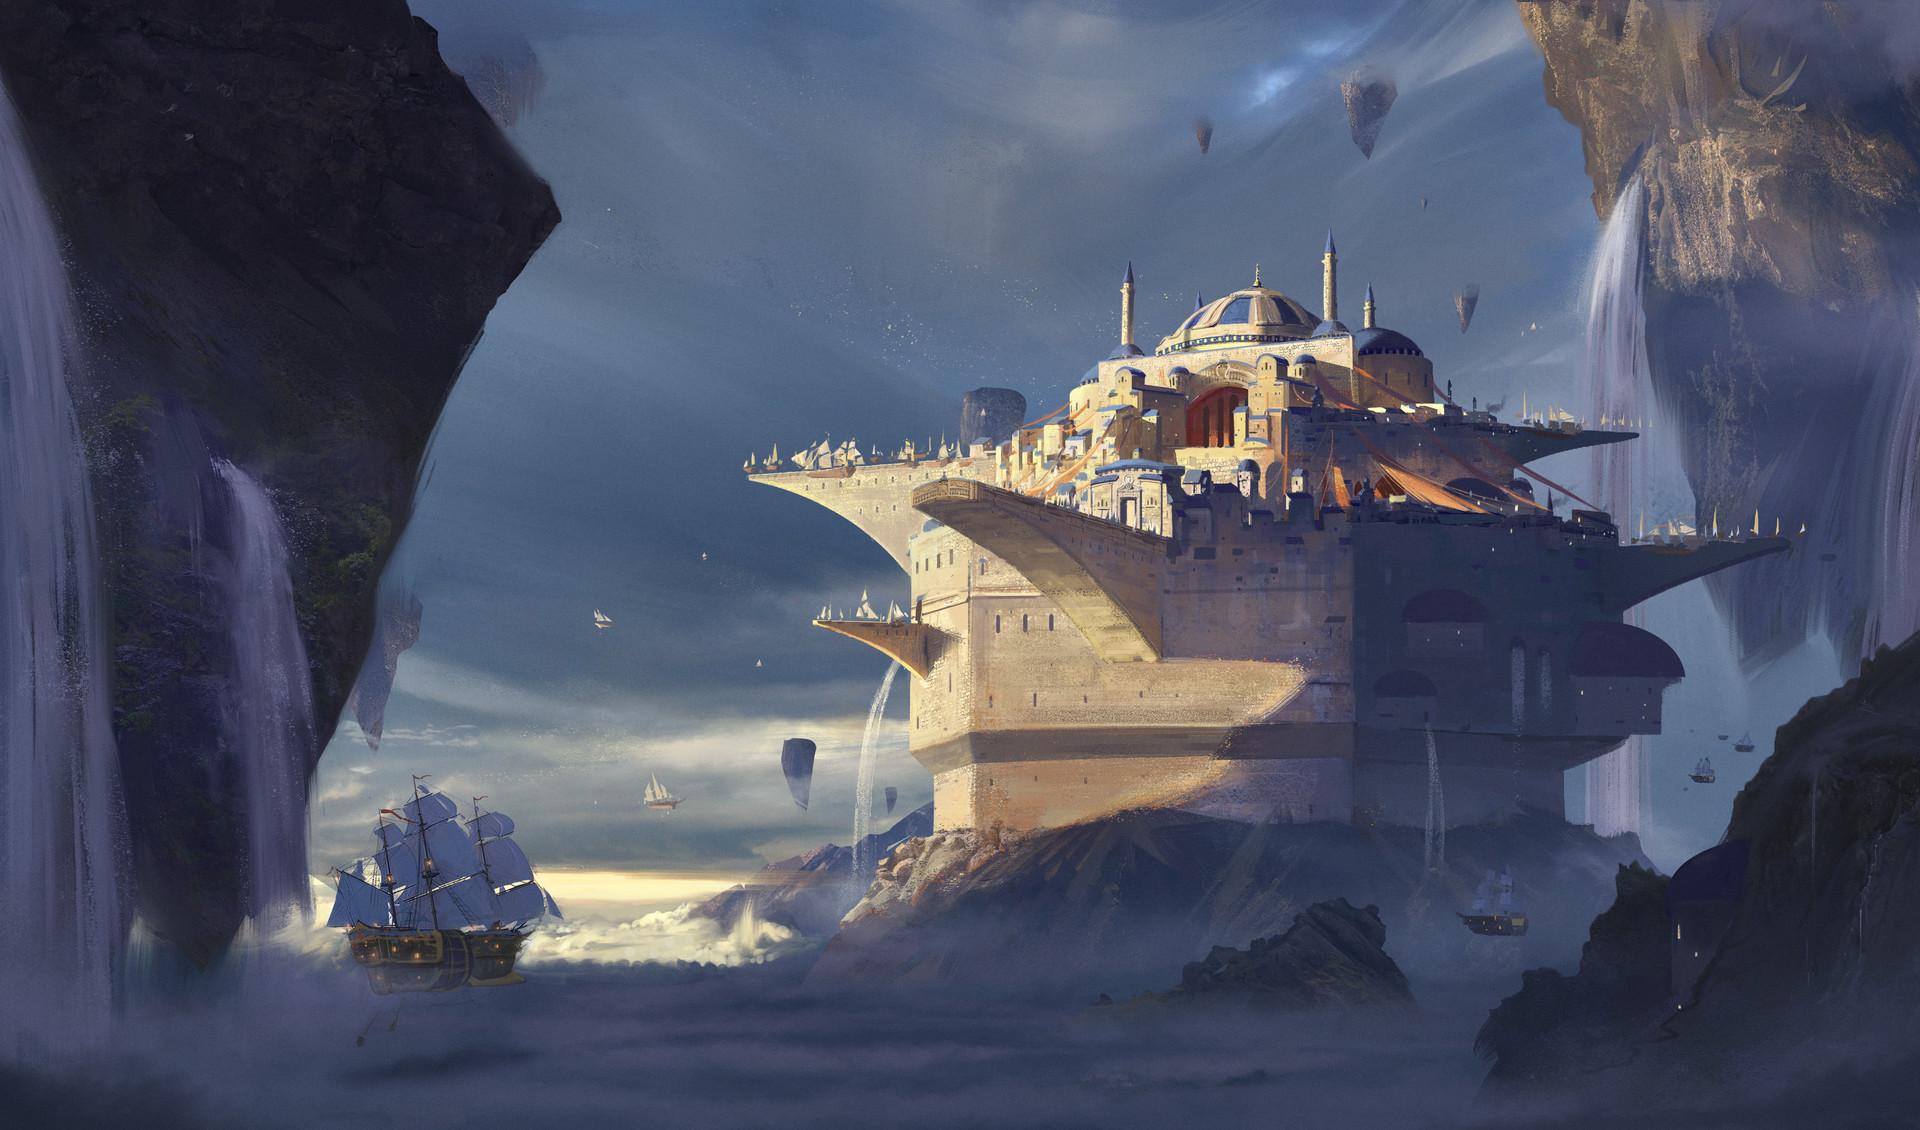 Jonas hassibi trading harbour